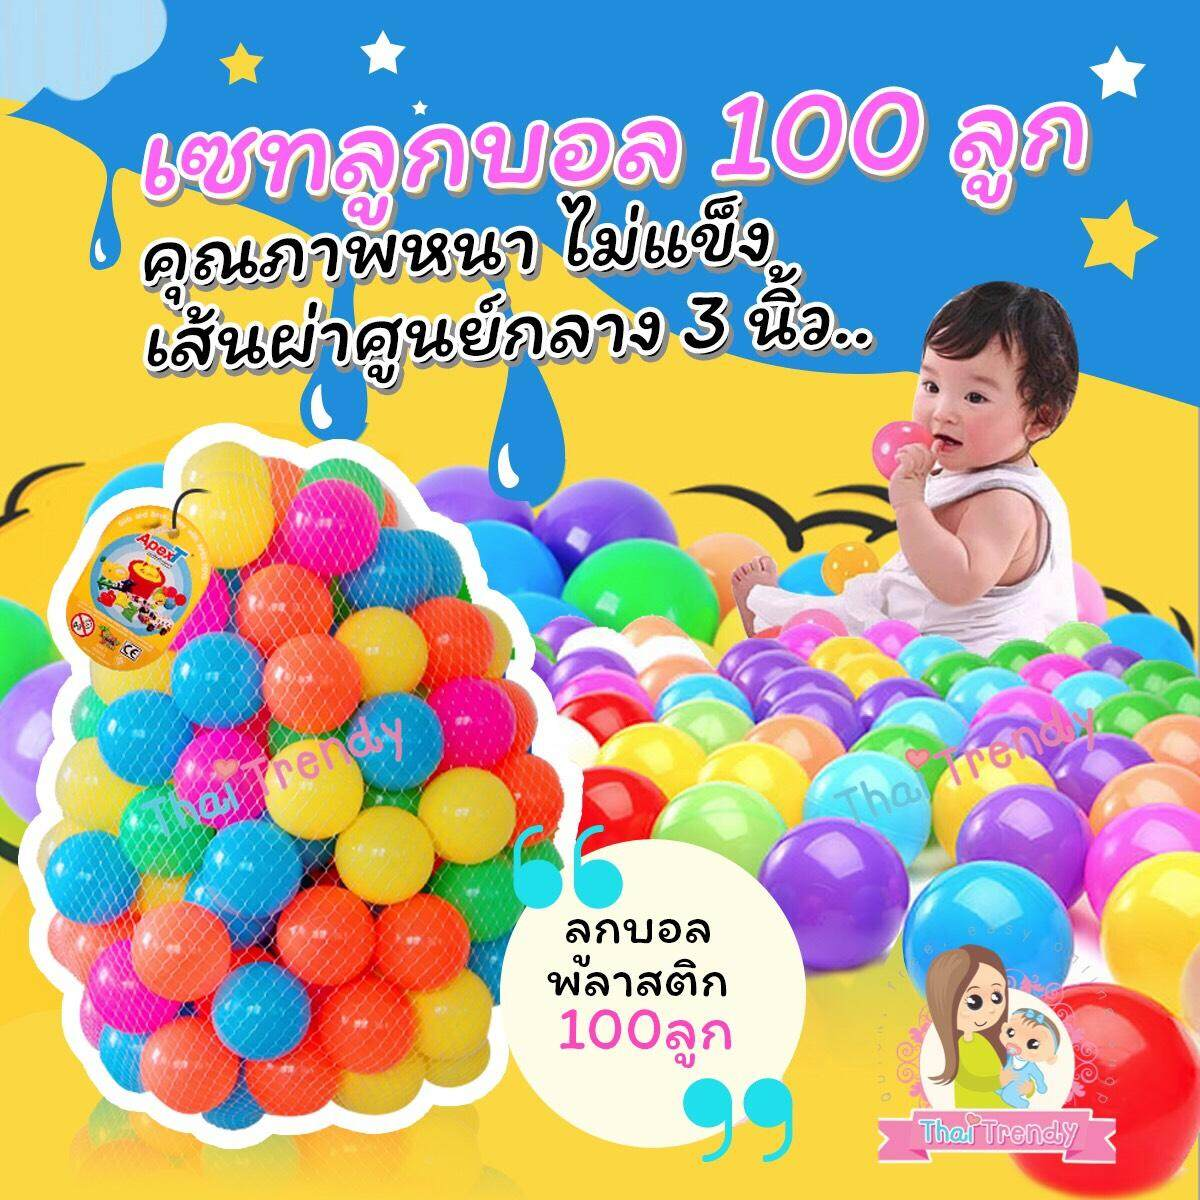 Thaitrendy ลูกบอลหลากสี 100 ลูก (มีมอก.ปลอดภัย 100%) By Thaitrendy.